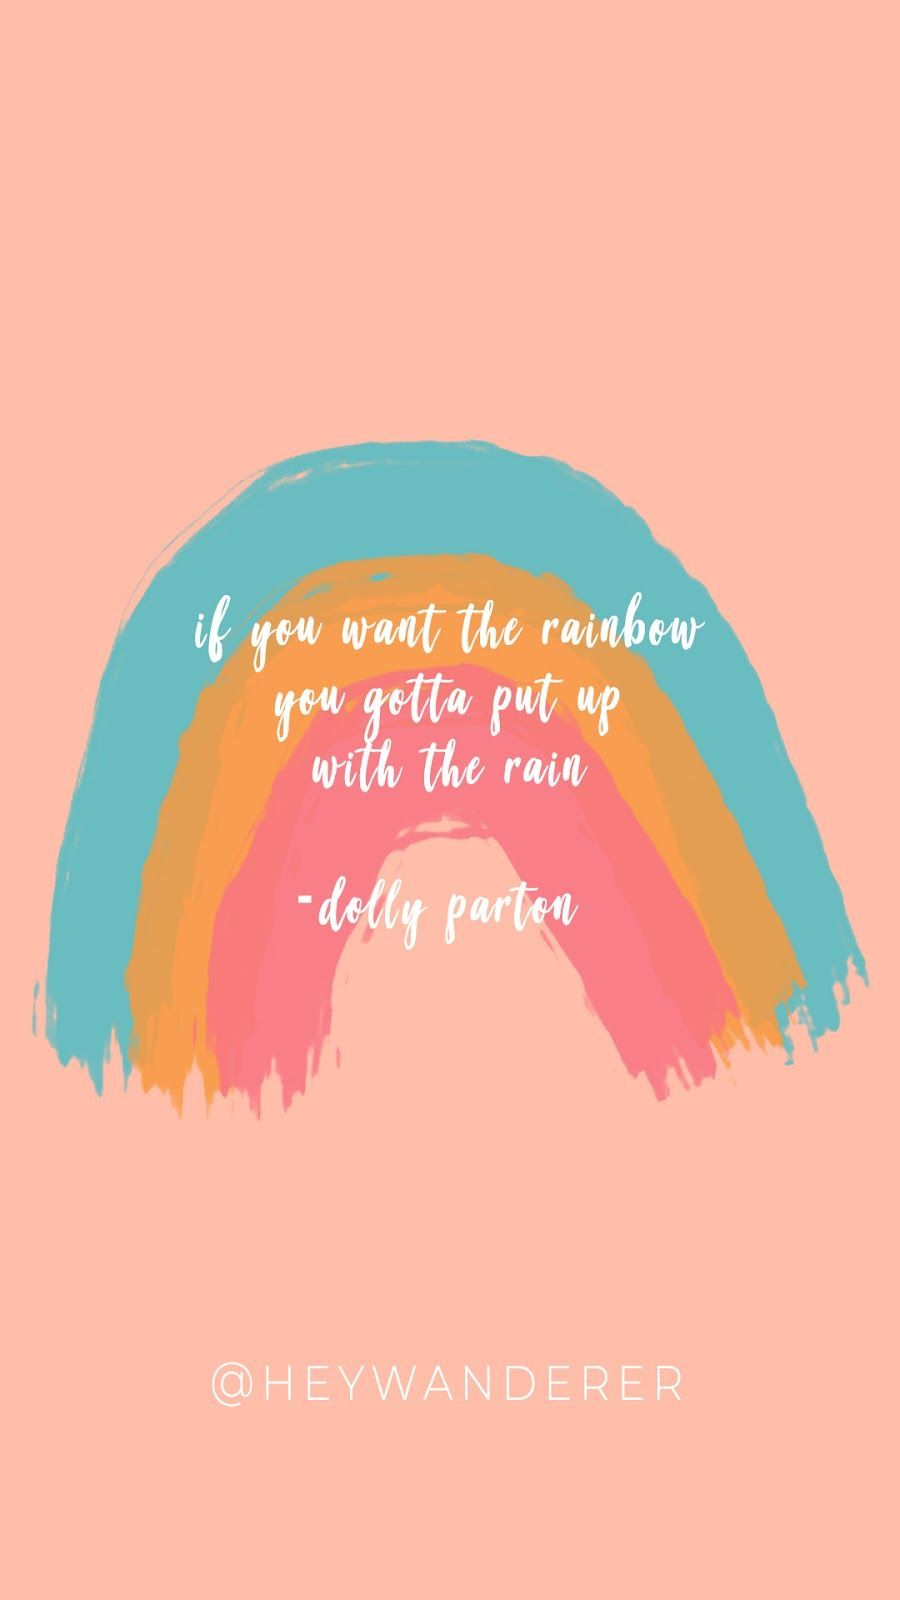 DIY Rainbow Letter Board + The Best Dolly Parton Quotes - #board #dolly #letter #parton #quotes #rainbow - #BabyRainbow